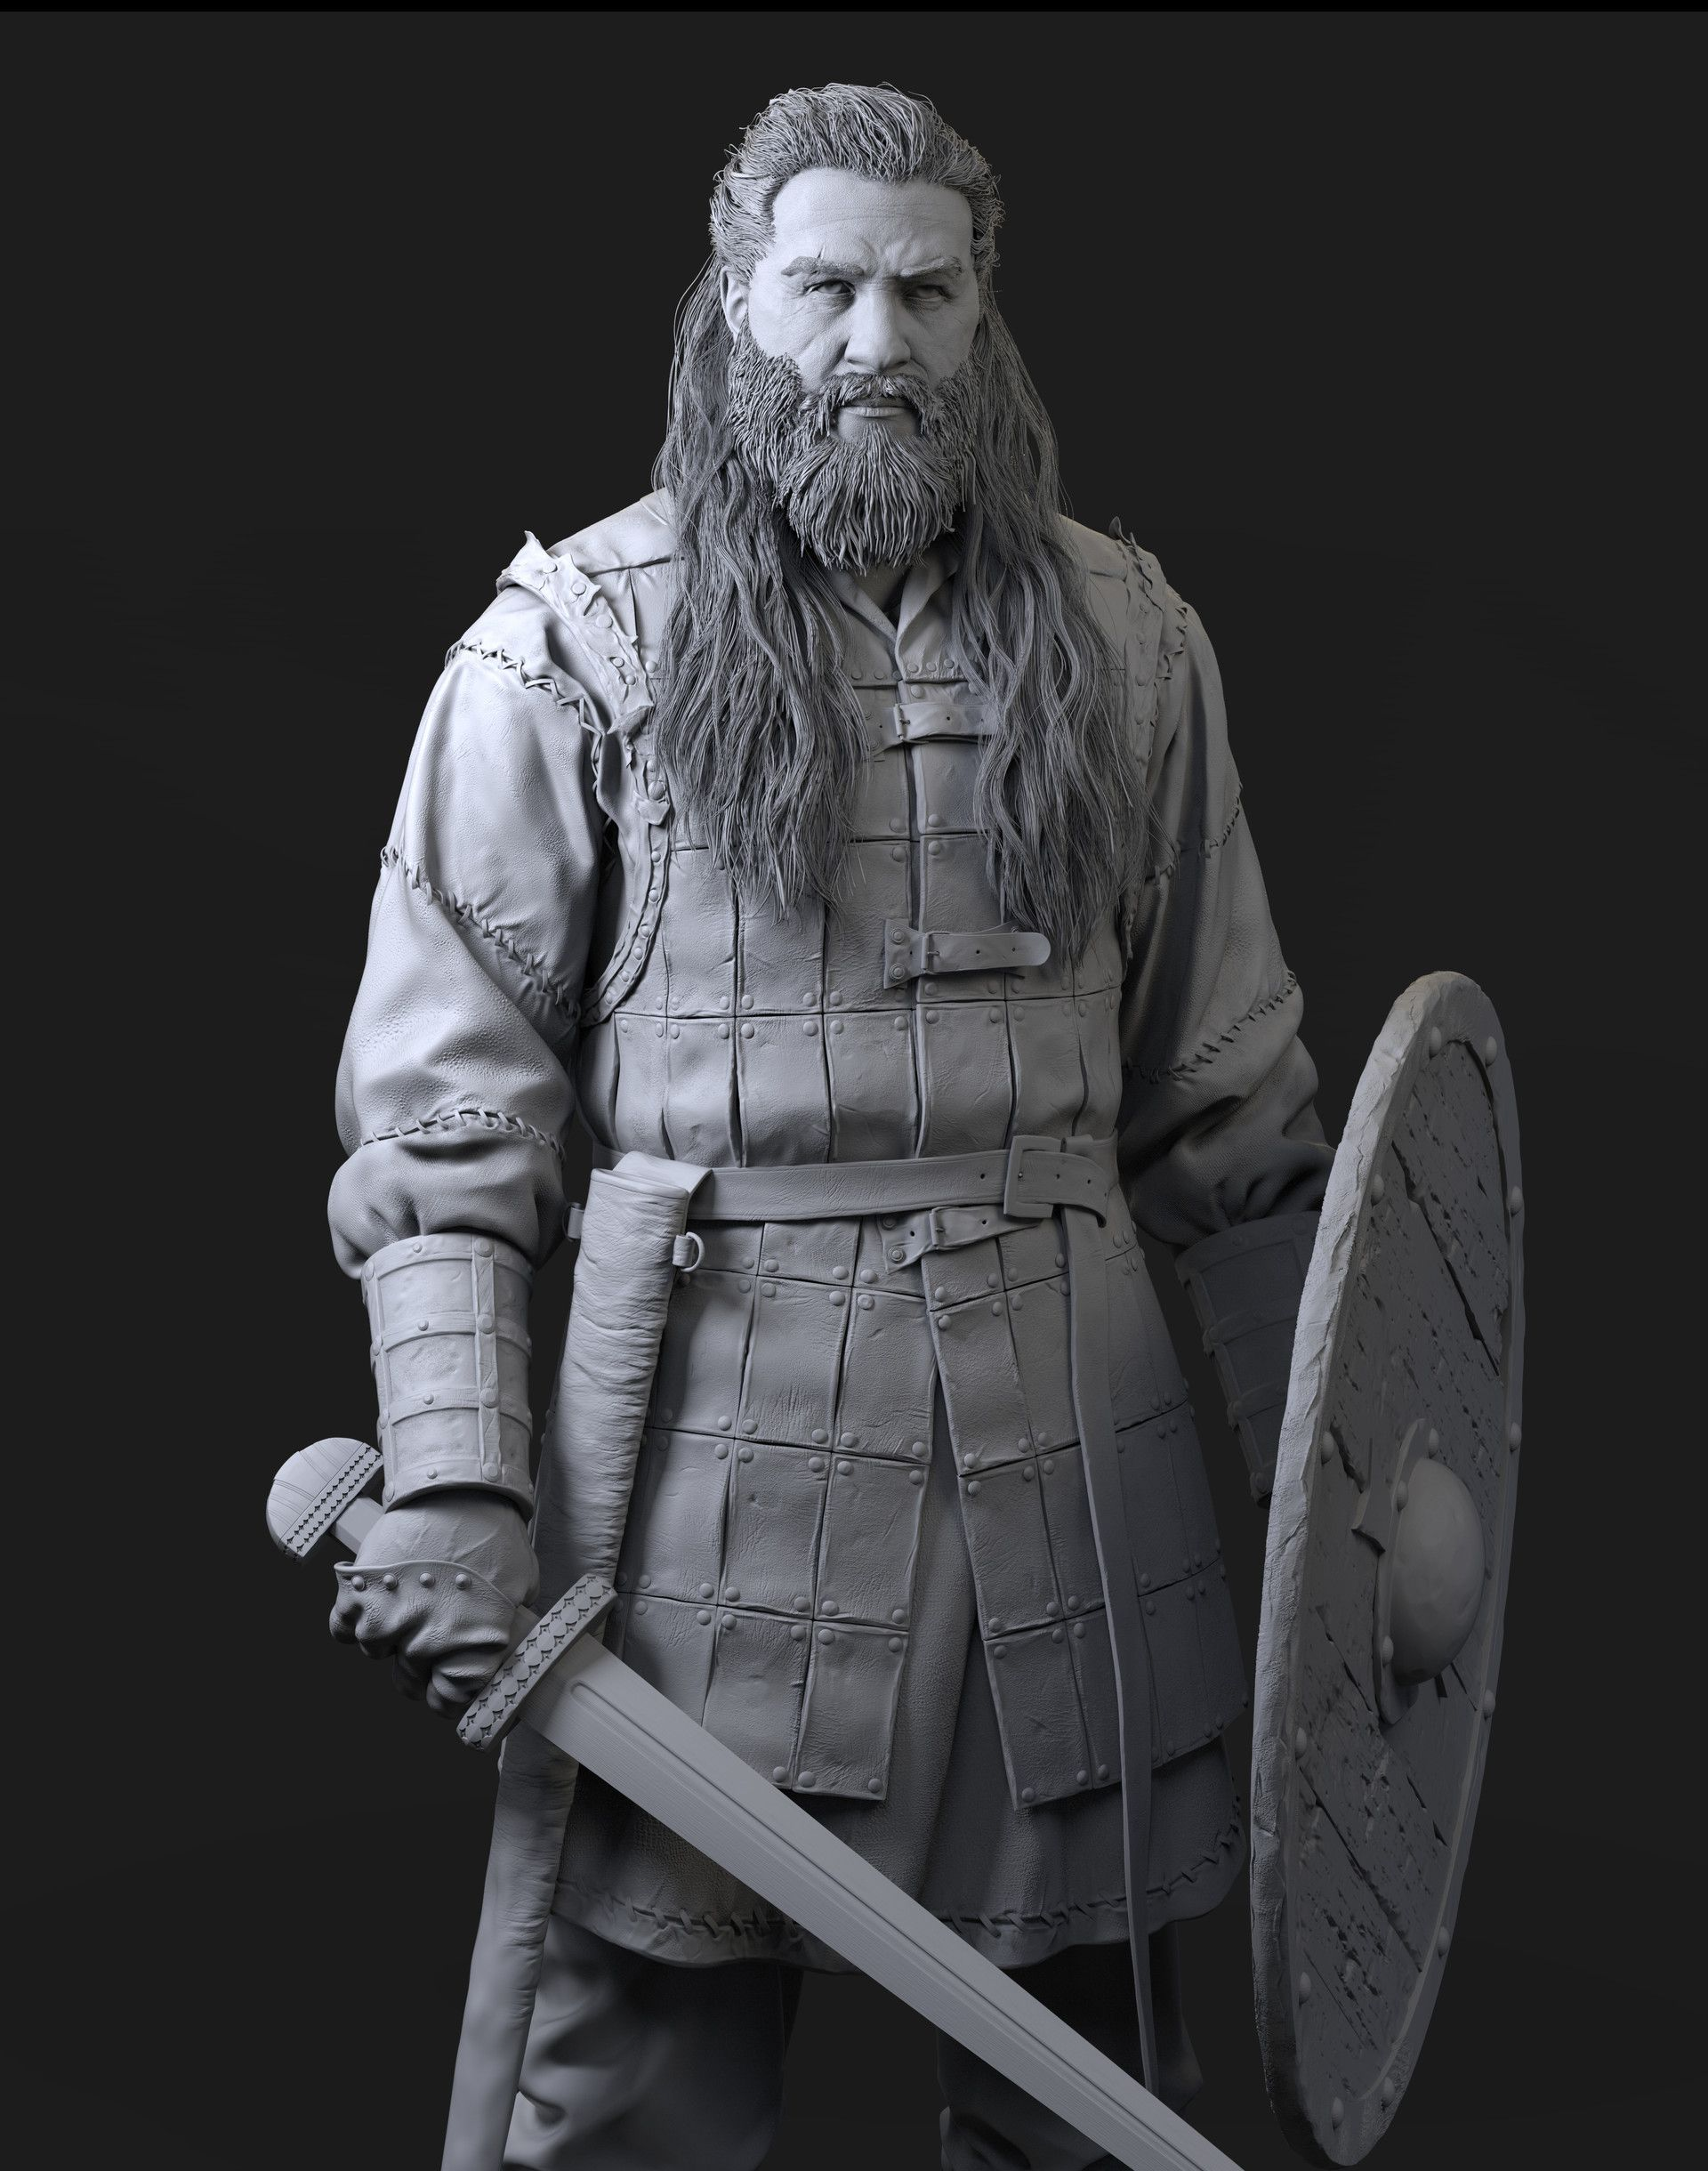 db1d4ca9a19 ArtStation - Vikings, Wang HY | Scupts in 2019 | Fantasy art ...